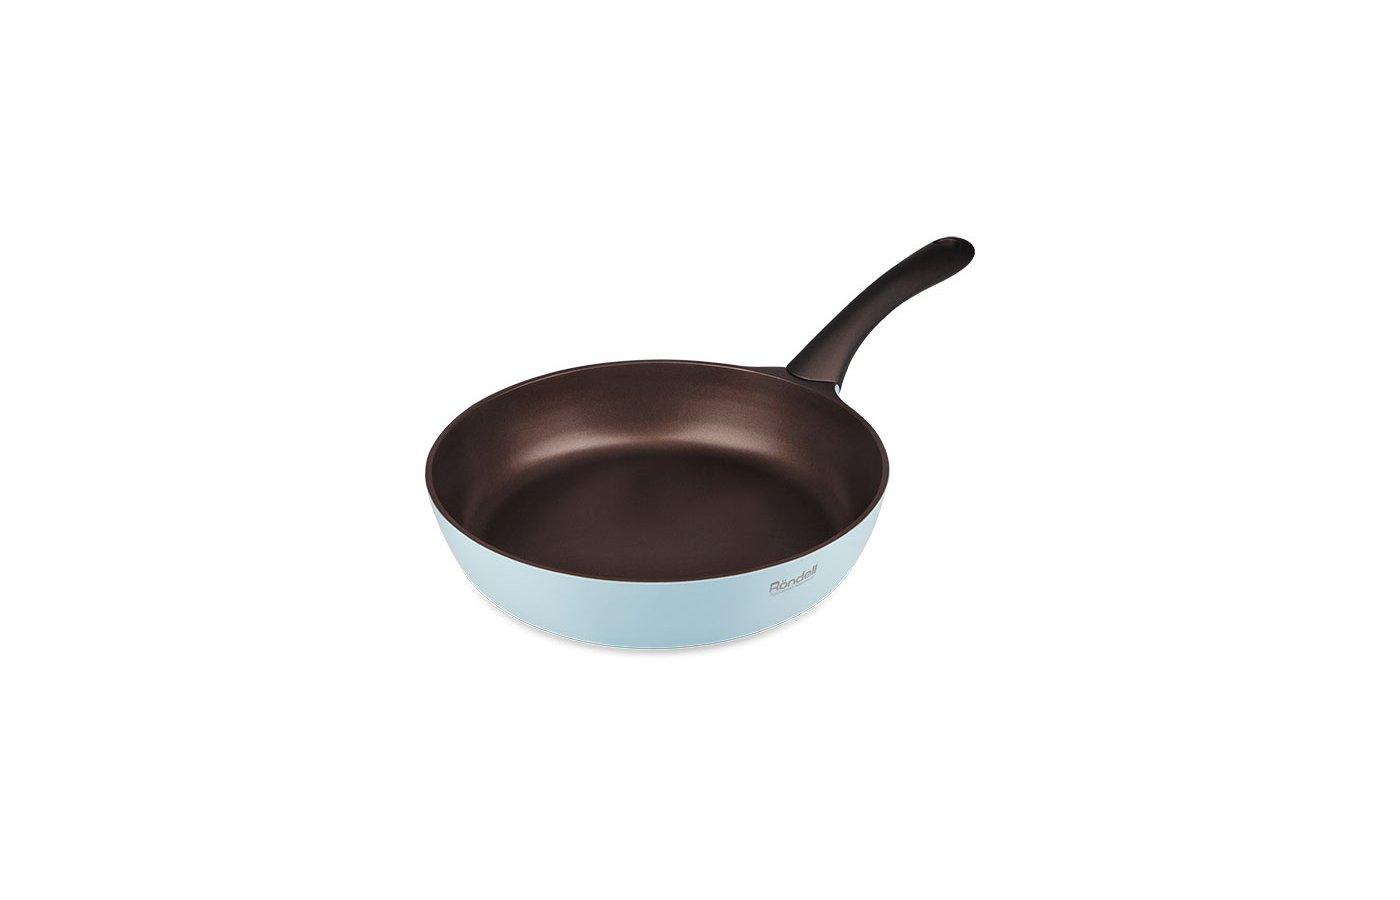 Сковорода Rondell RDA-761 28 см Rhapsody